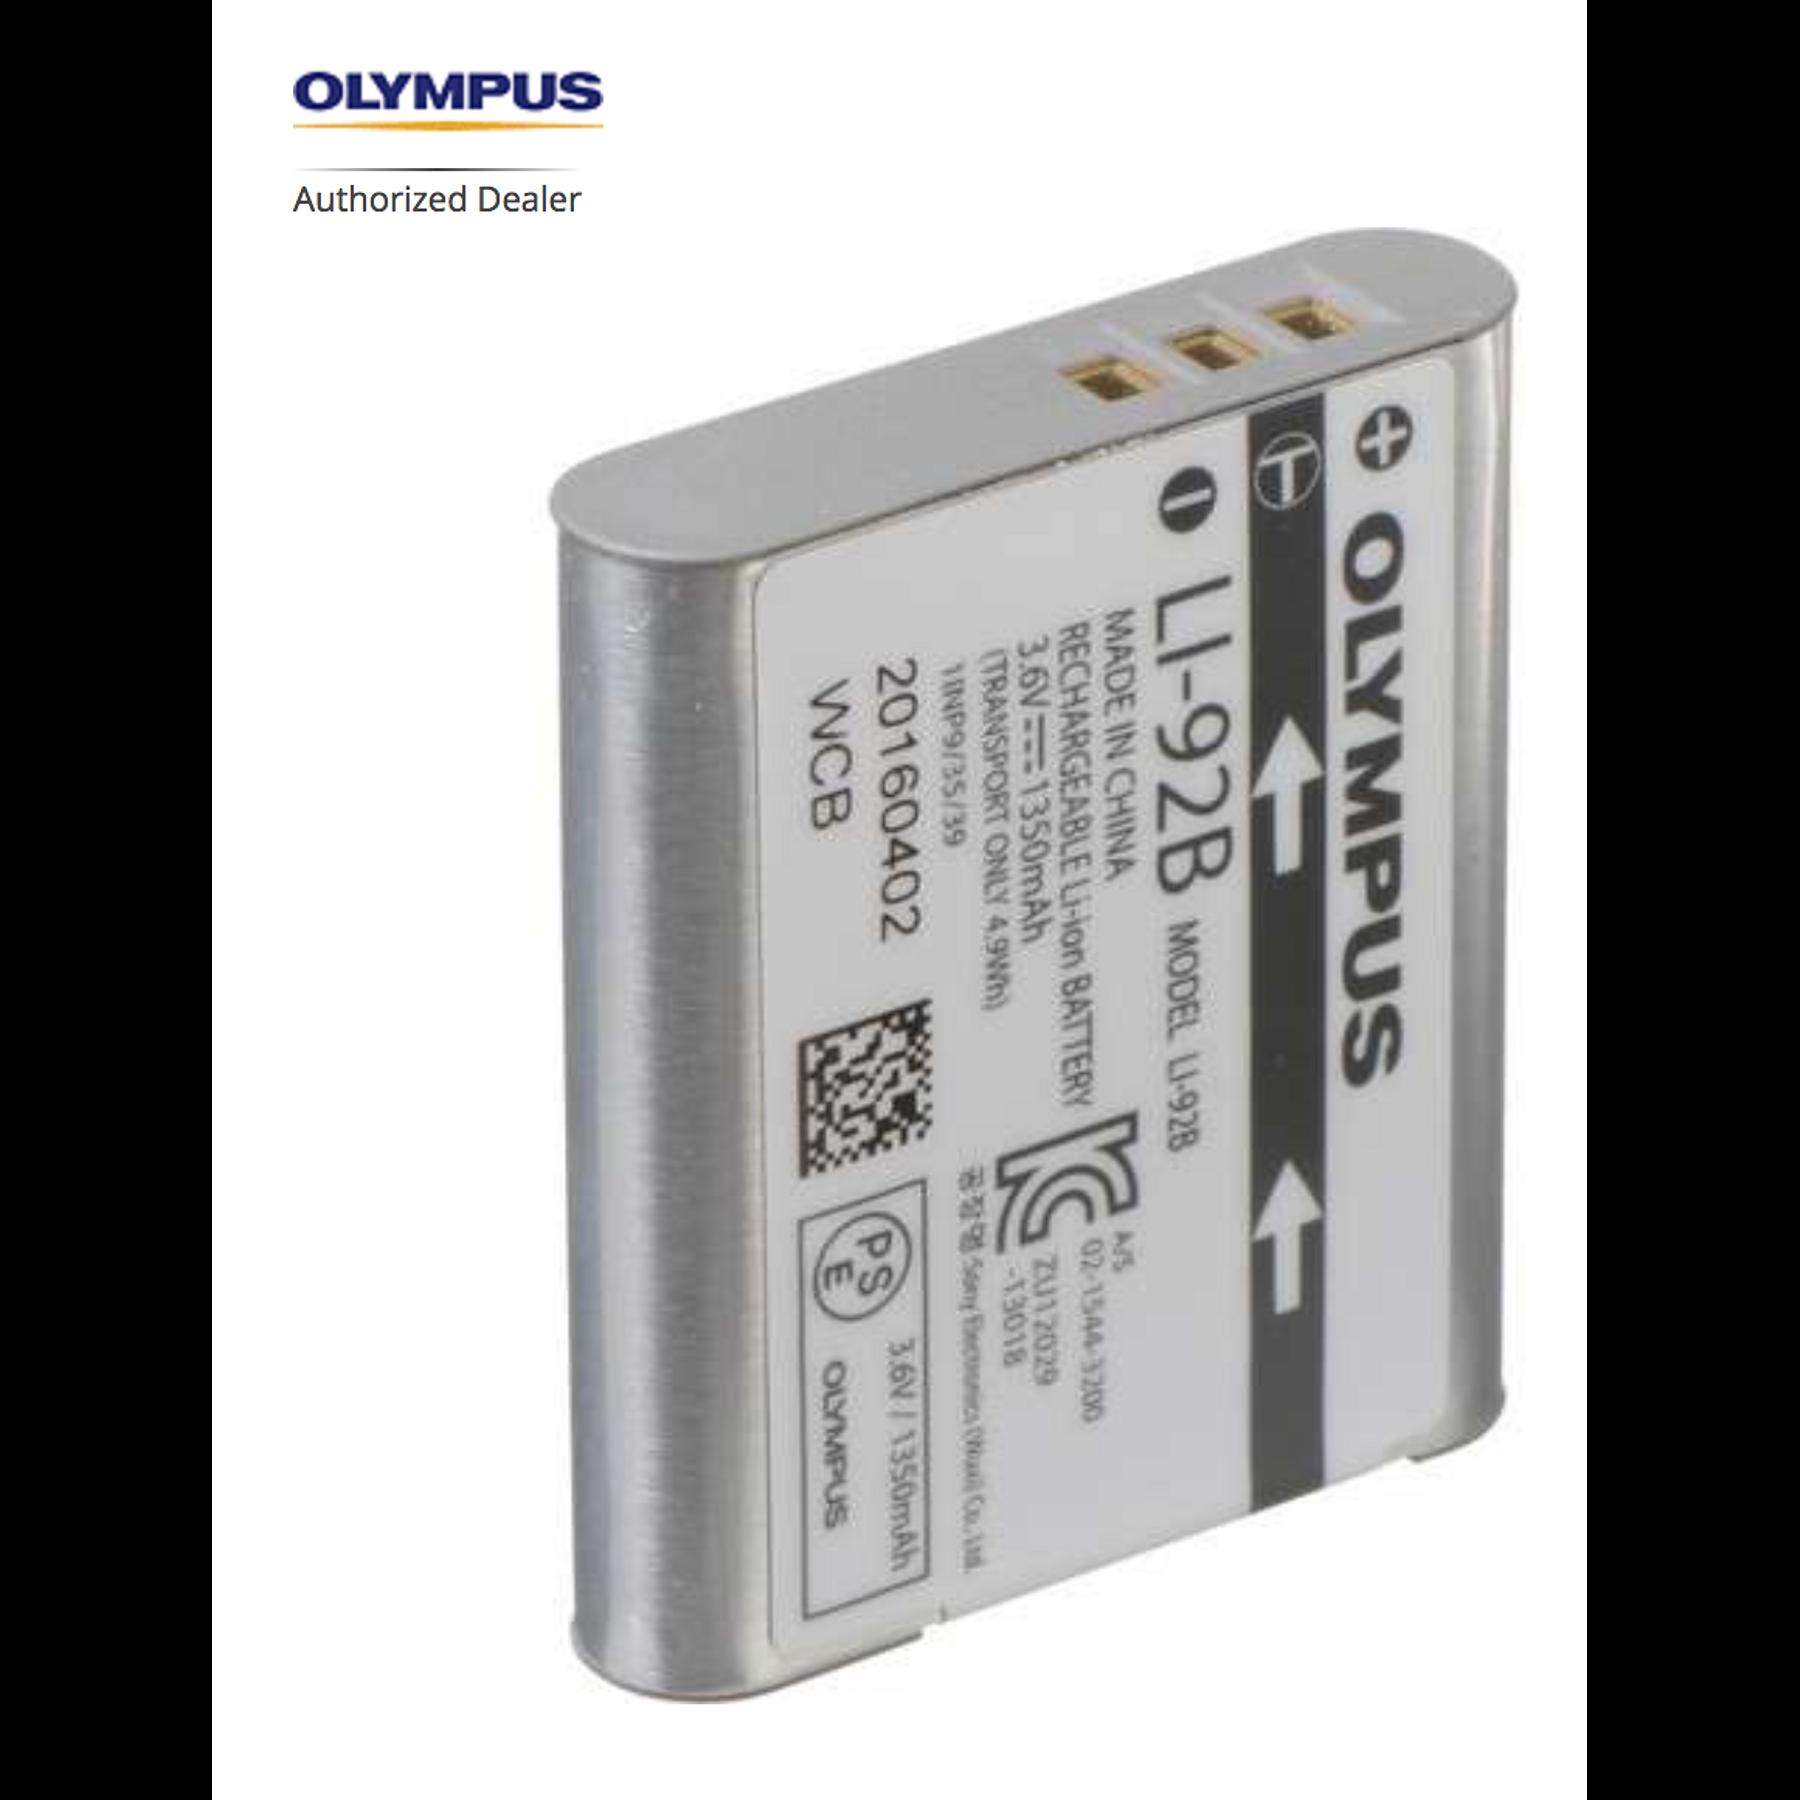 BATERIA OLYMPUS TOUGH TG5 / TG6 CÓDIGO #V6200660U000